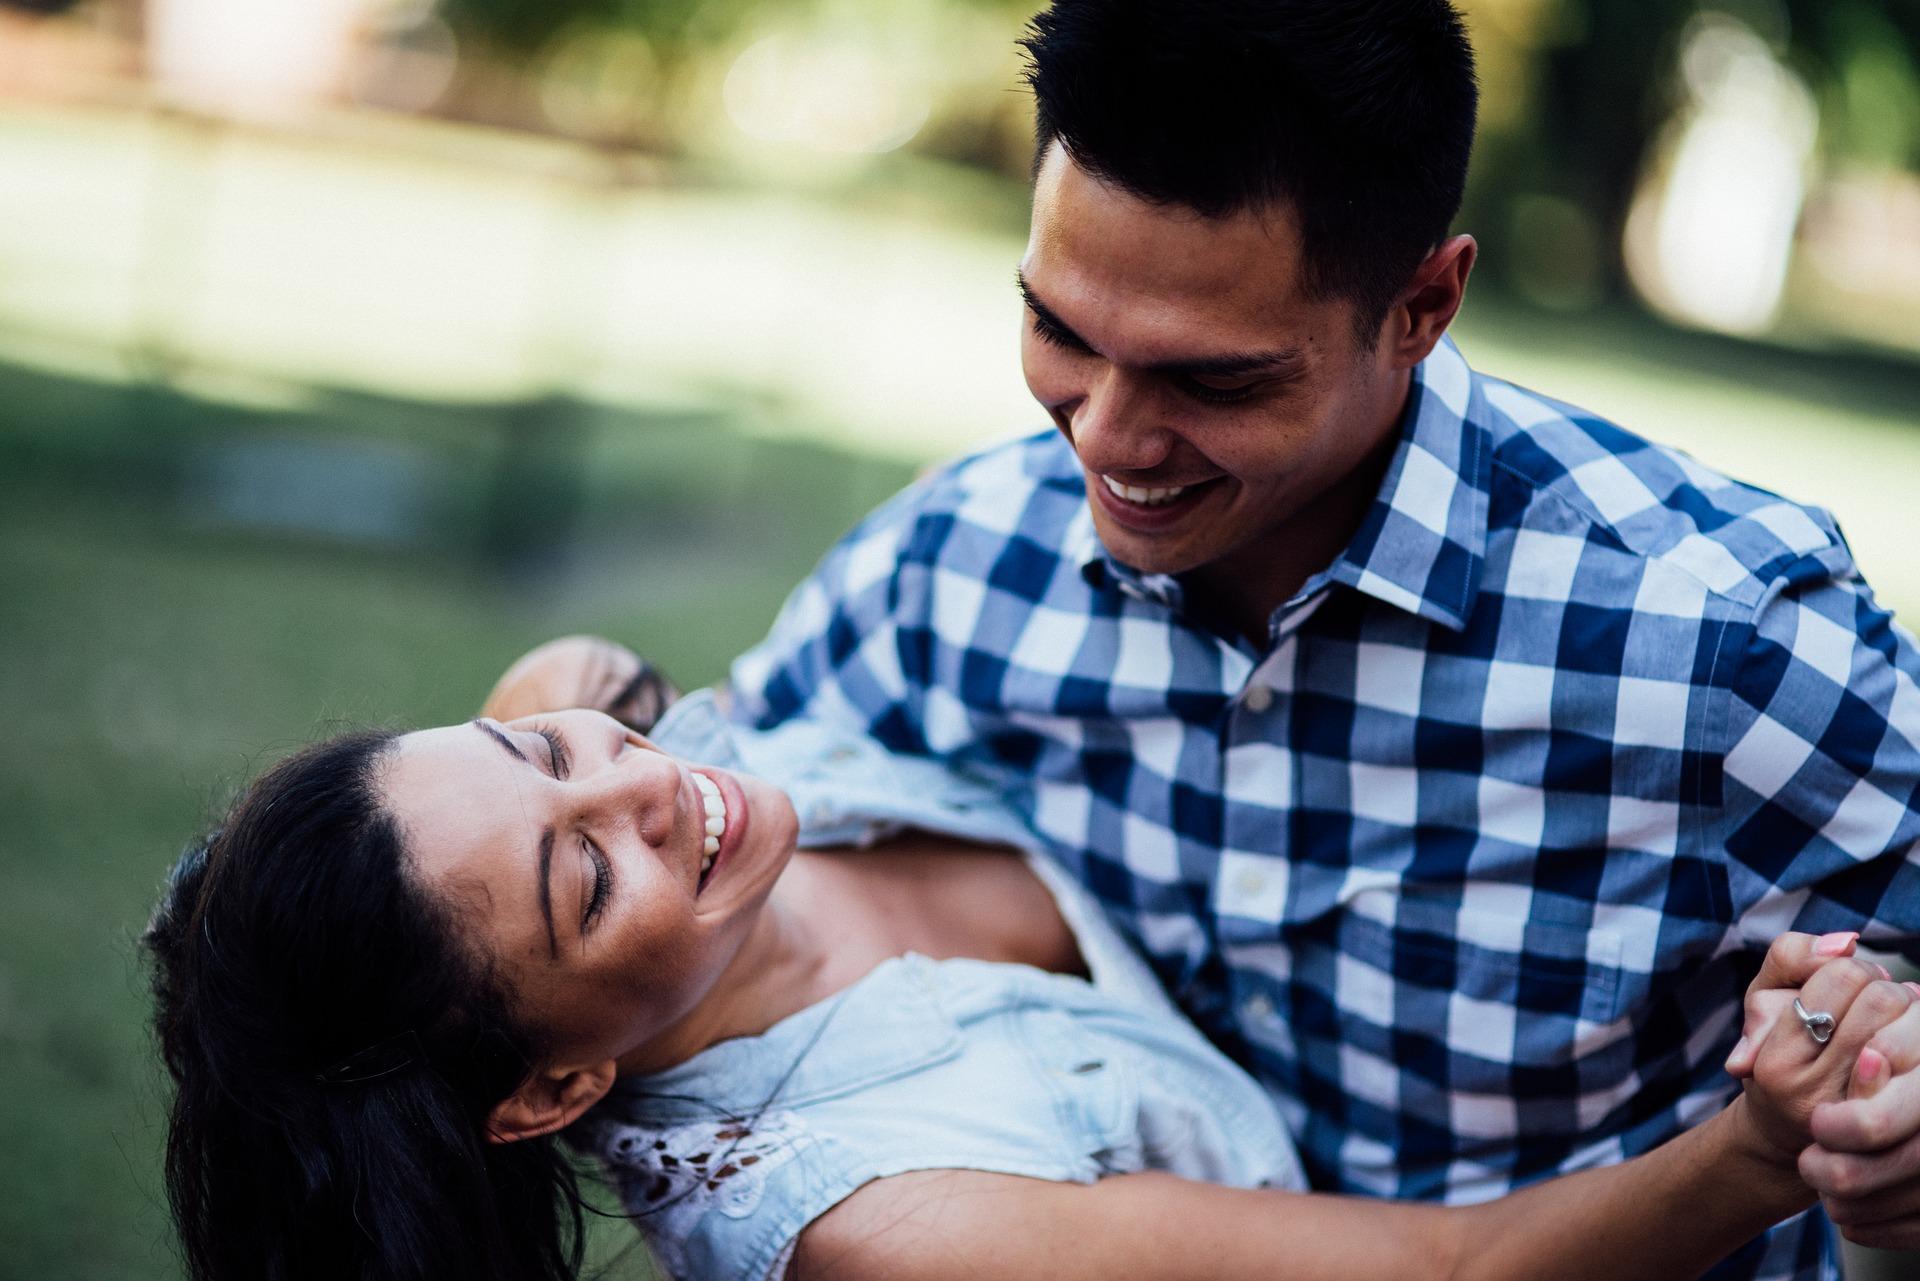 Online Dating in Ennis - Dating Site for Sociable Singles in